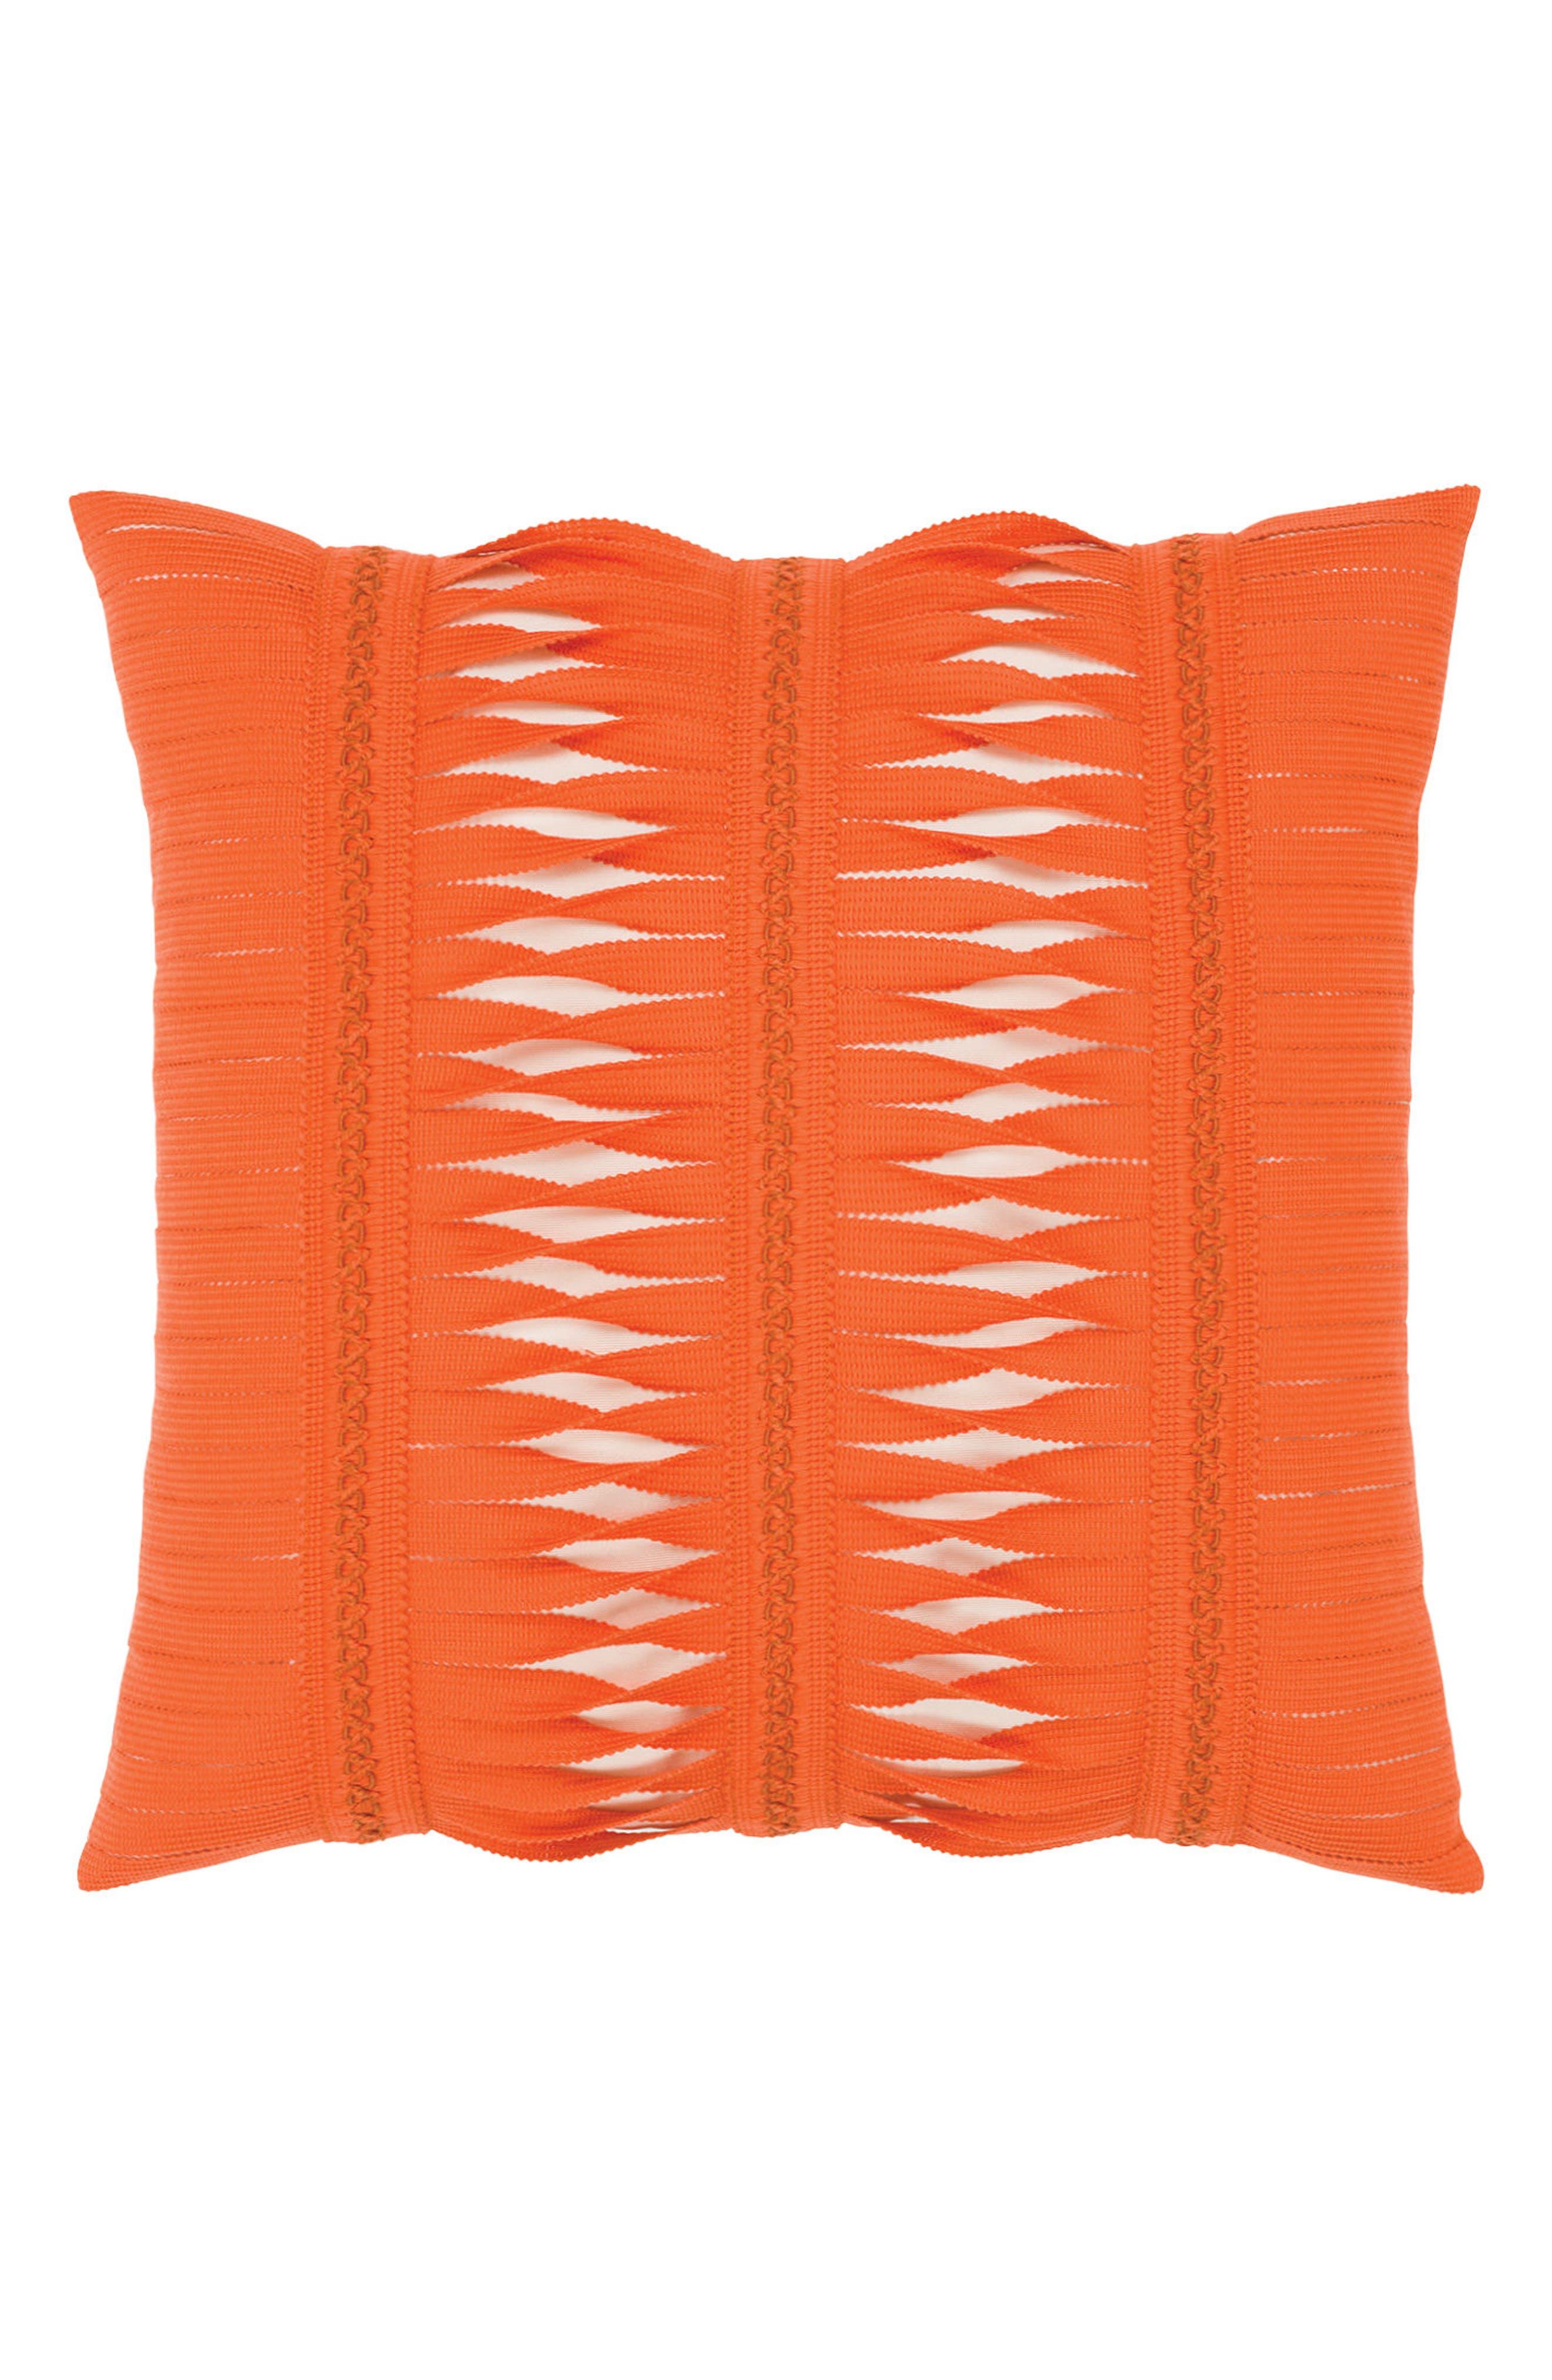 Gladiator Coral Indoor/Outdoor Accent Pillow,                         Main,                         color, Orange